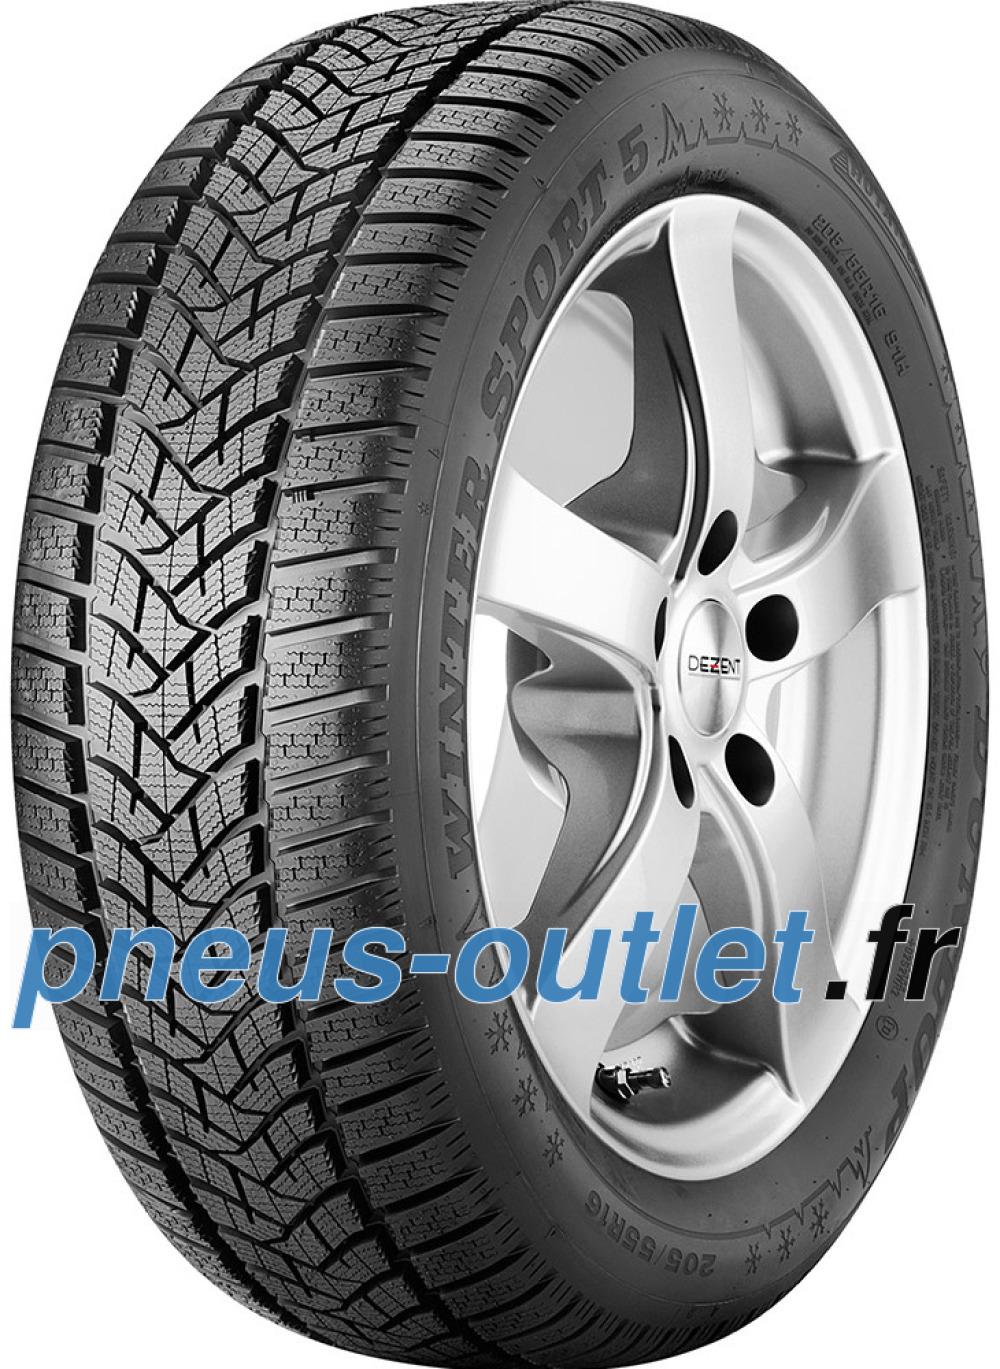 Dunlop Winter Sport 5 ( 255/45 R20 105V XL , MO, SUV, avec protège-jante (MFS) )